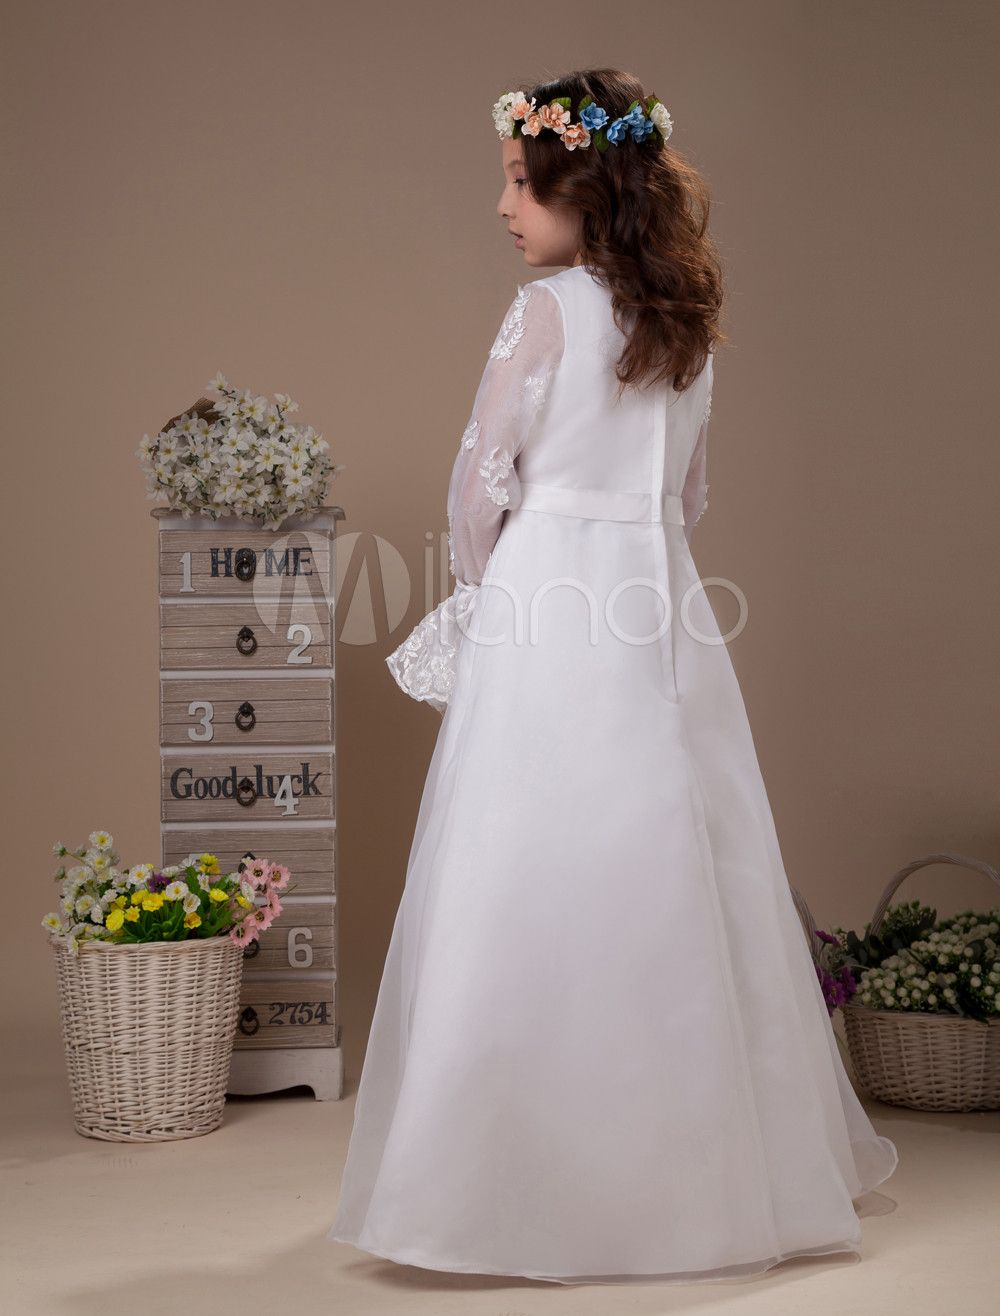 ec65acfa926 White Flower Girl Dress Boho Long Sleeves Embroidery Satin Kids Formal  Party Dress  Dress